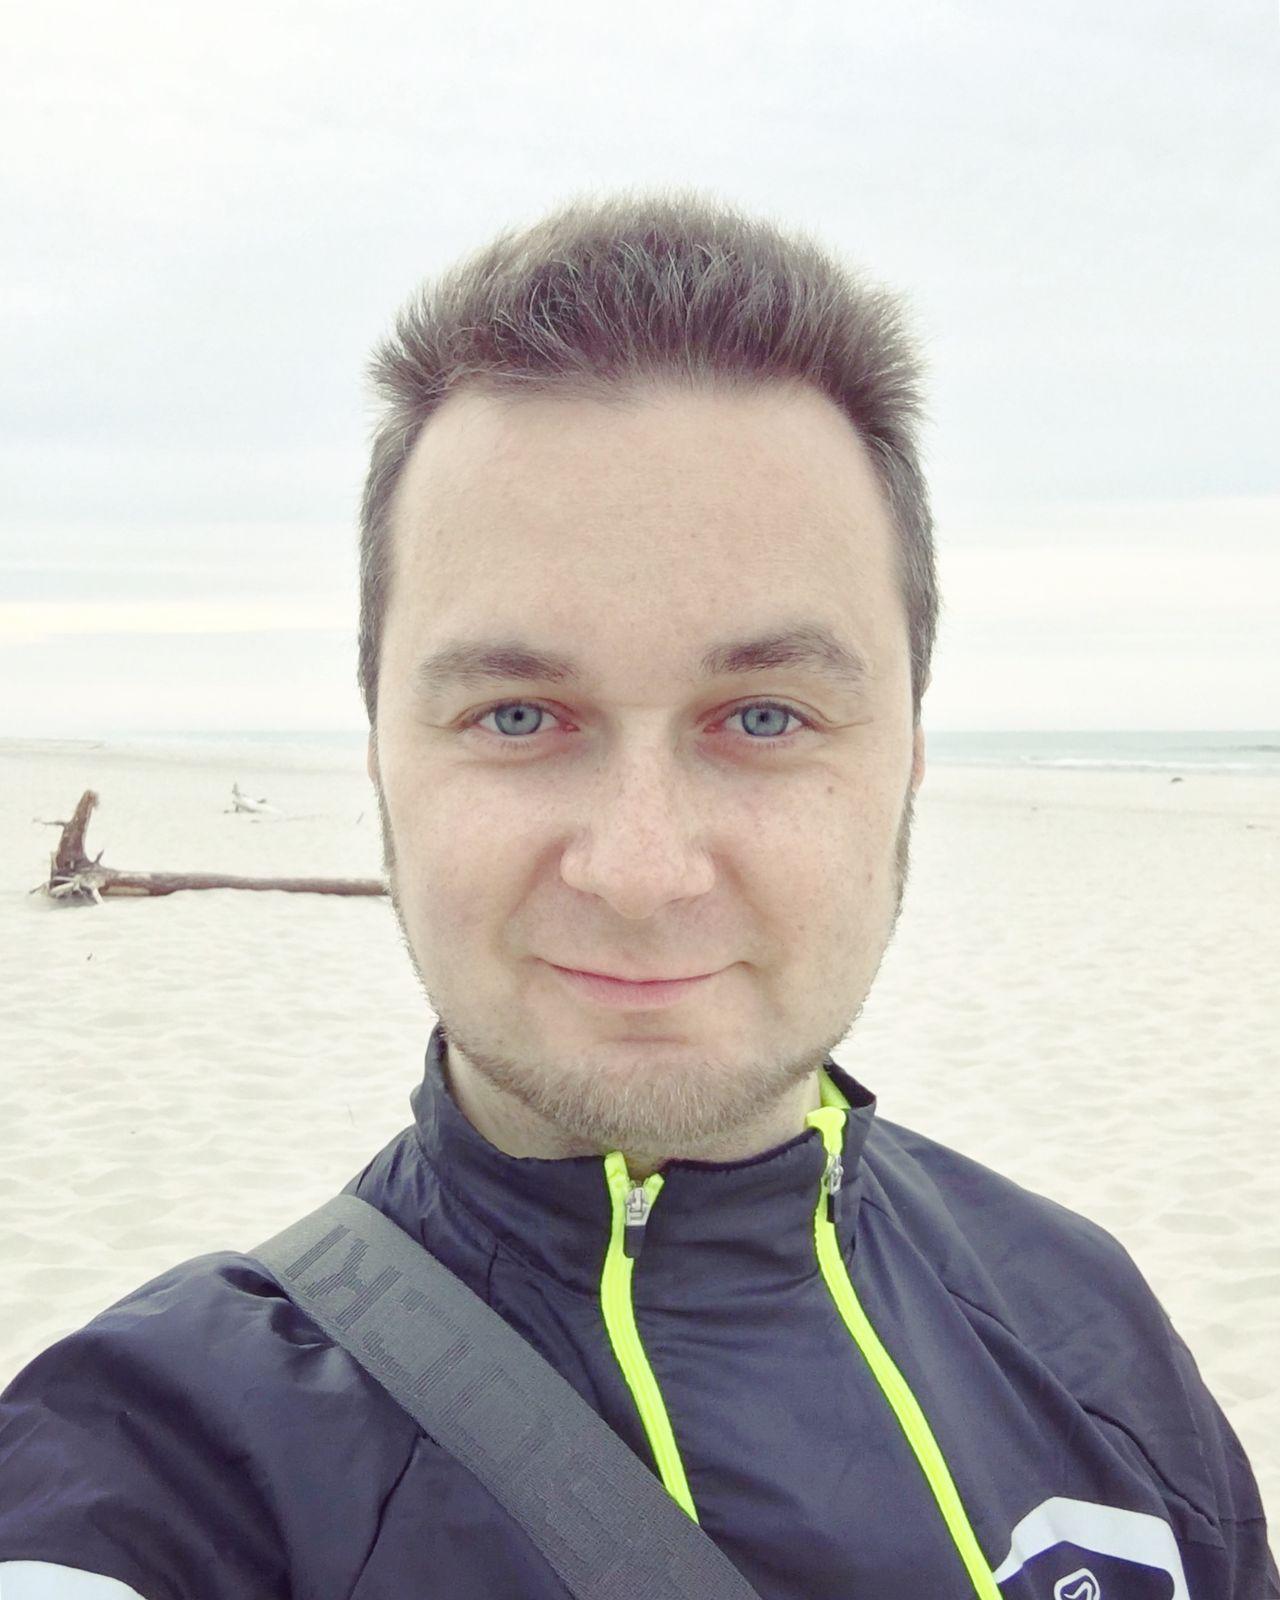 Baltic Baltic Sea Beach BlueEyes Emptybeach Handsome Handsomeman IPhone IPhoneography Looking At Camera Man Mysterious National Park Poland Polishboy  Portrait Sand Sand Dune Sand Dunes Selfie Spring Springtime Słowiński National Park Słowiński Park Narodowy łeba